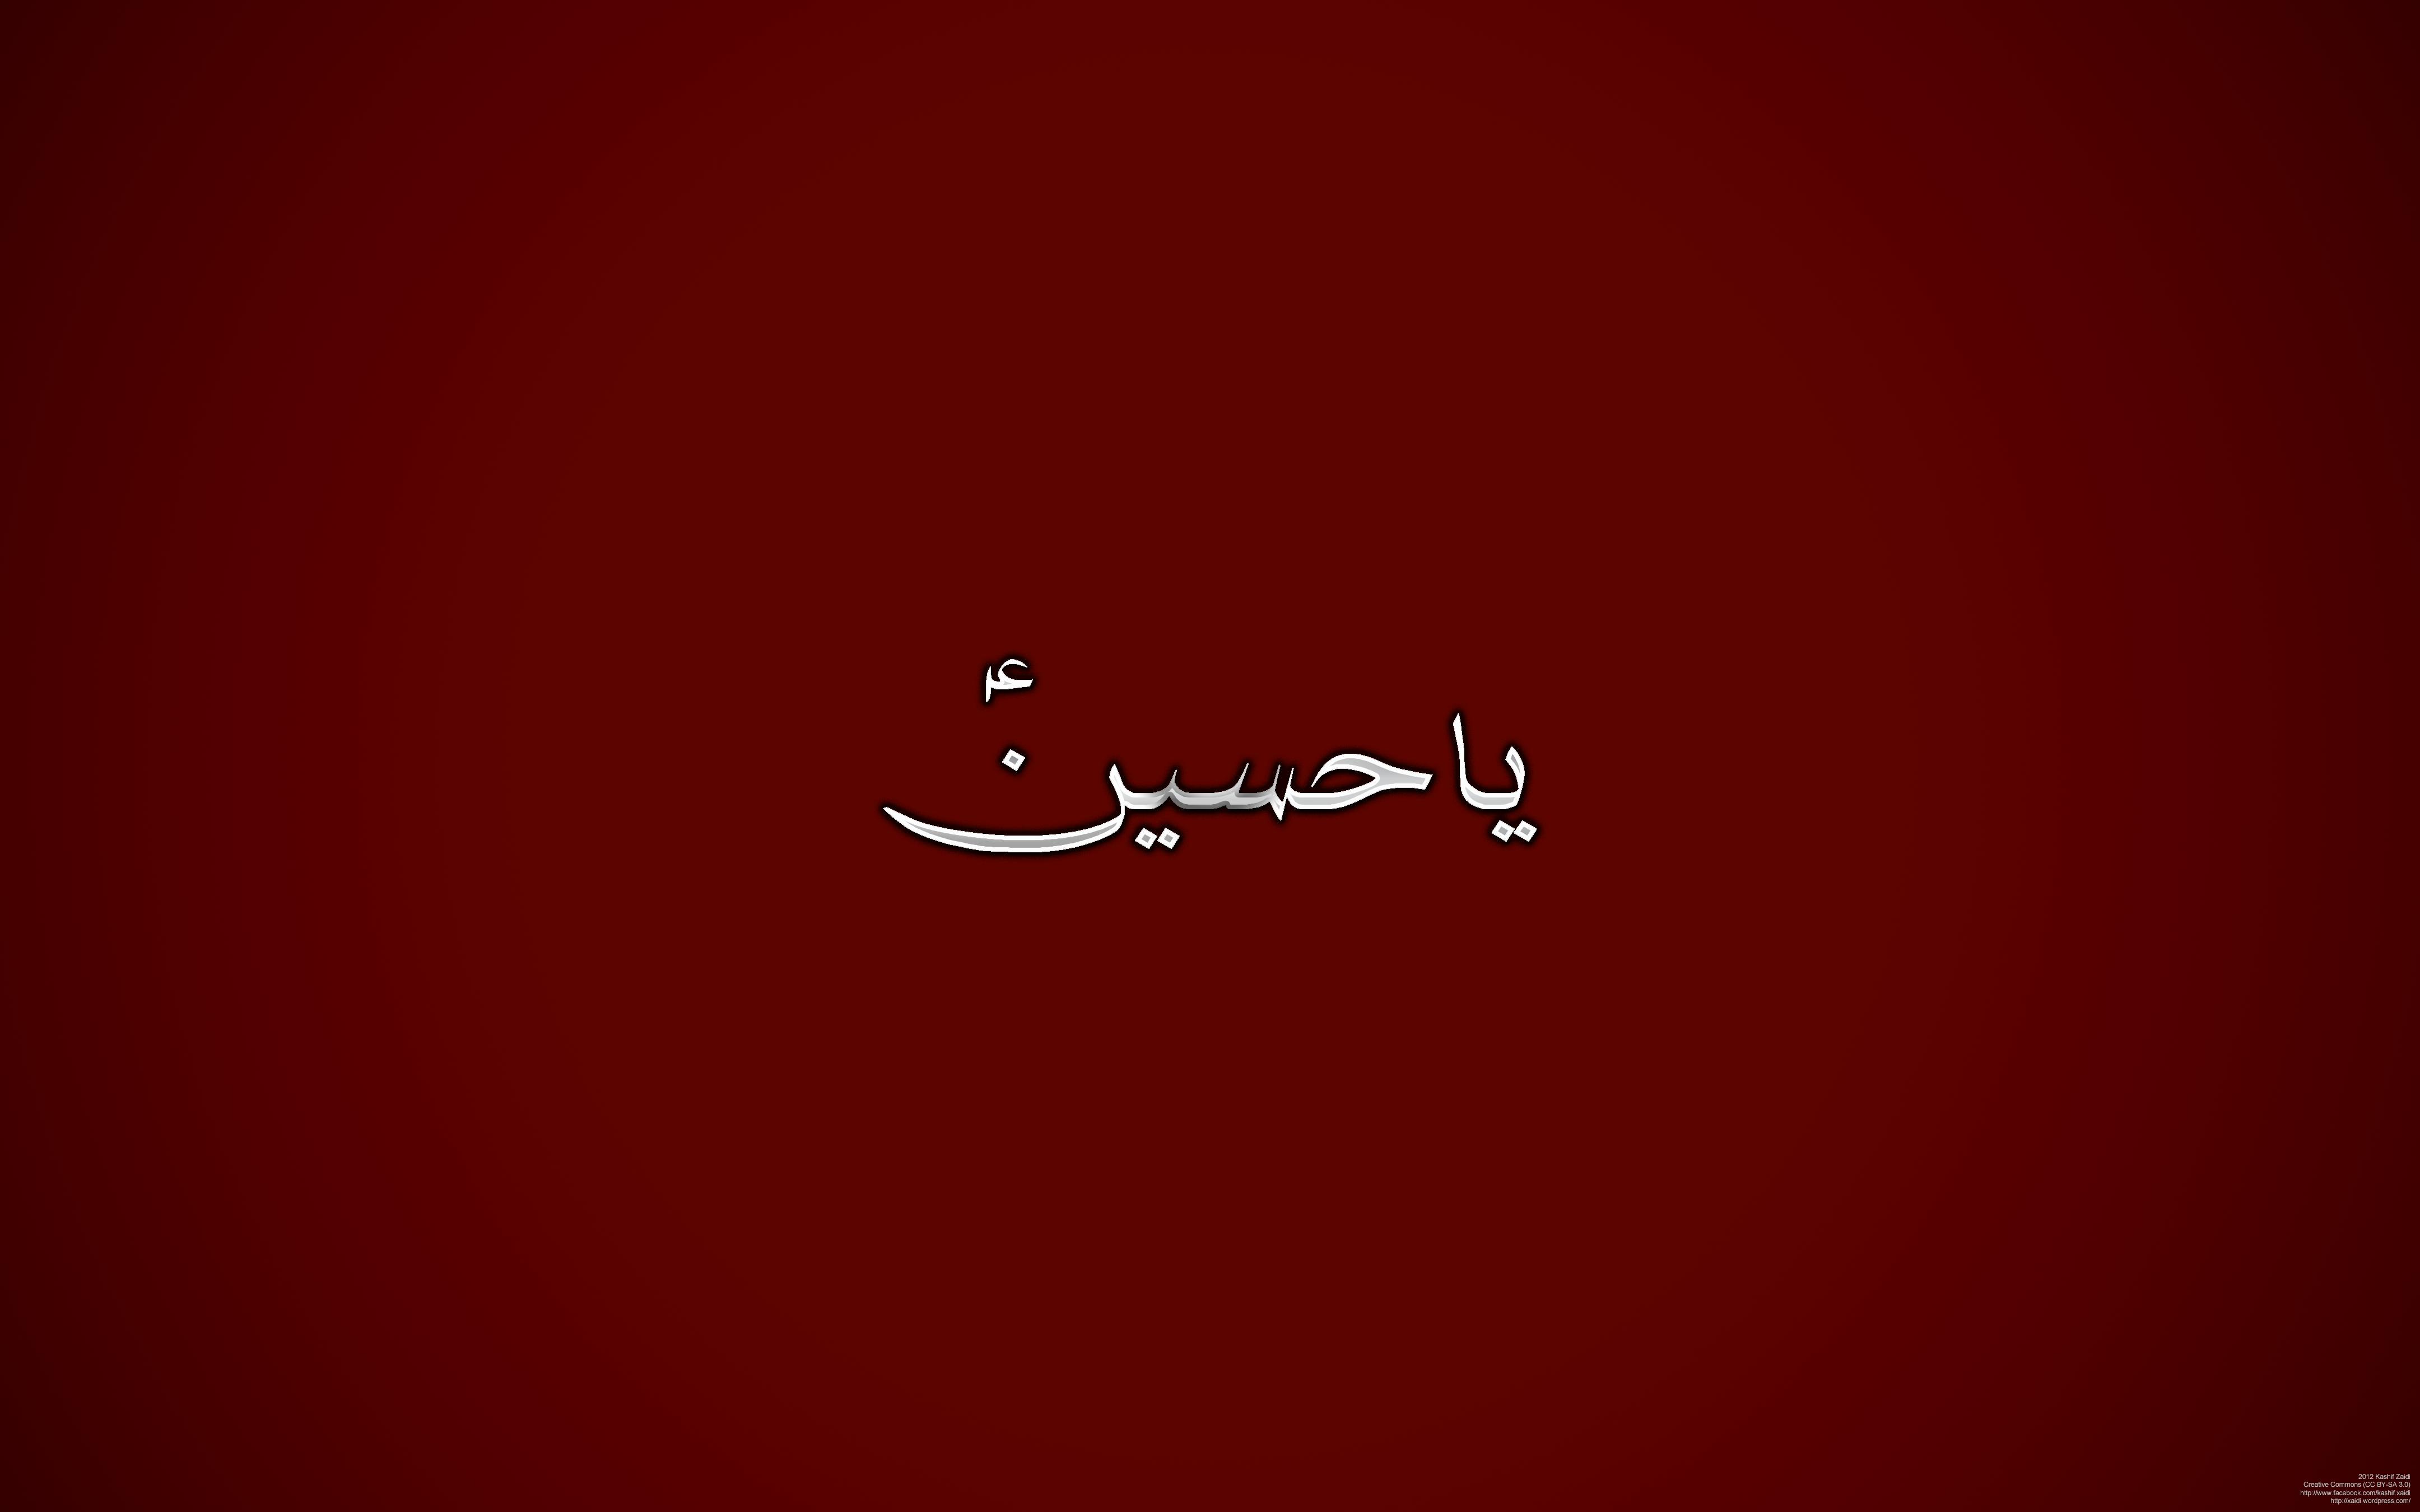 Hd wallpaper ya hussain - Ali A S Moula 4320 2700 By Xaidi S Is Licensed Under A